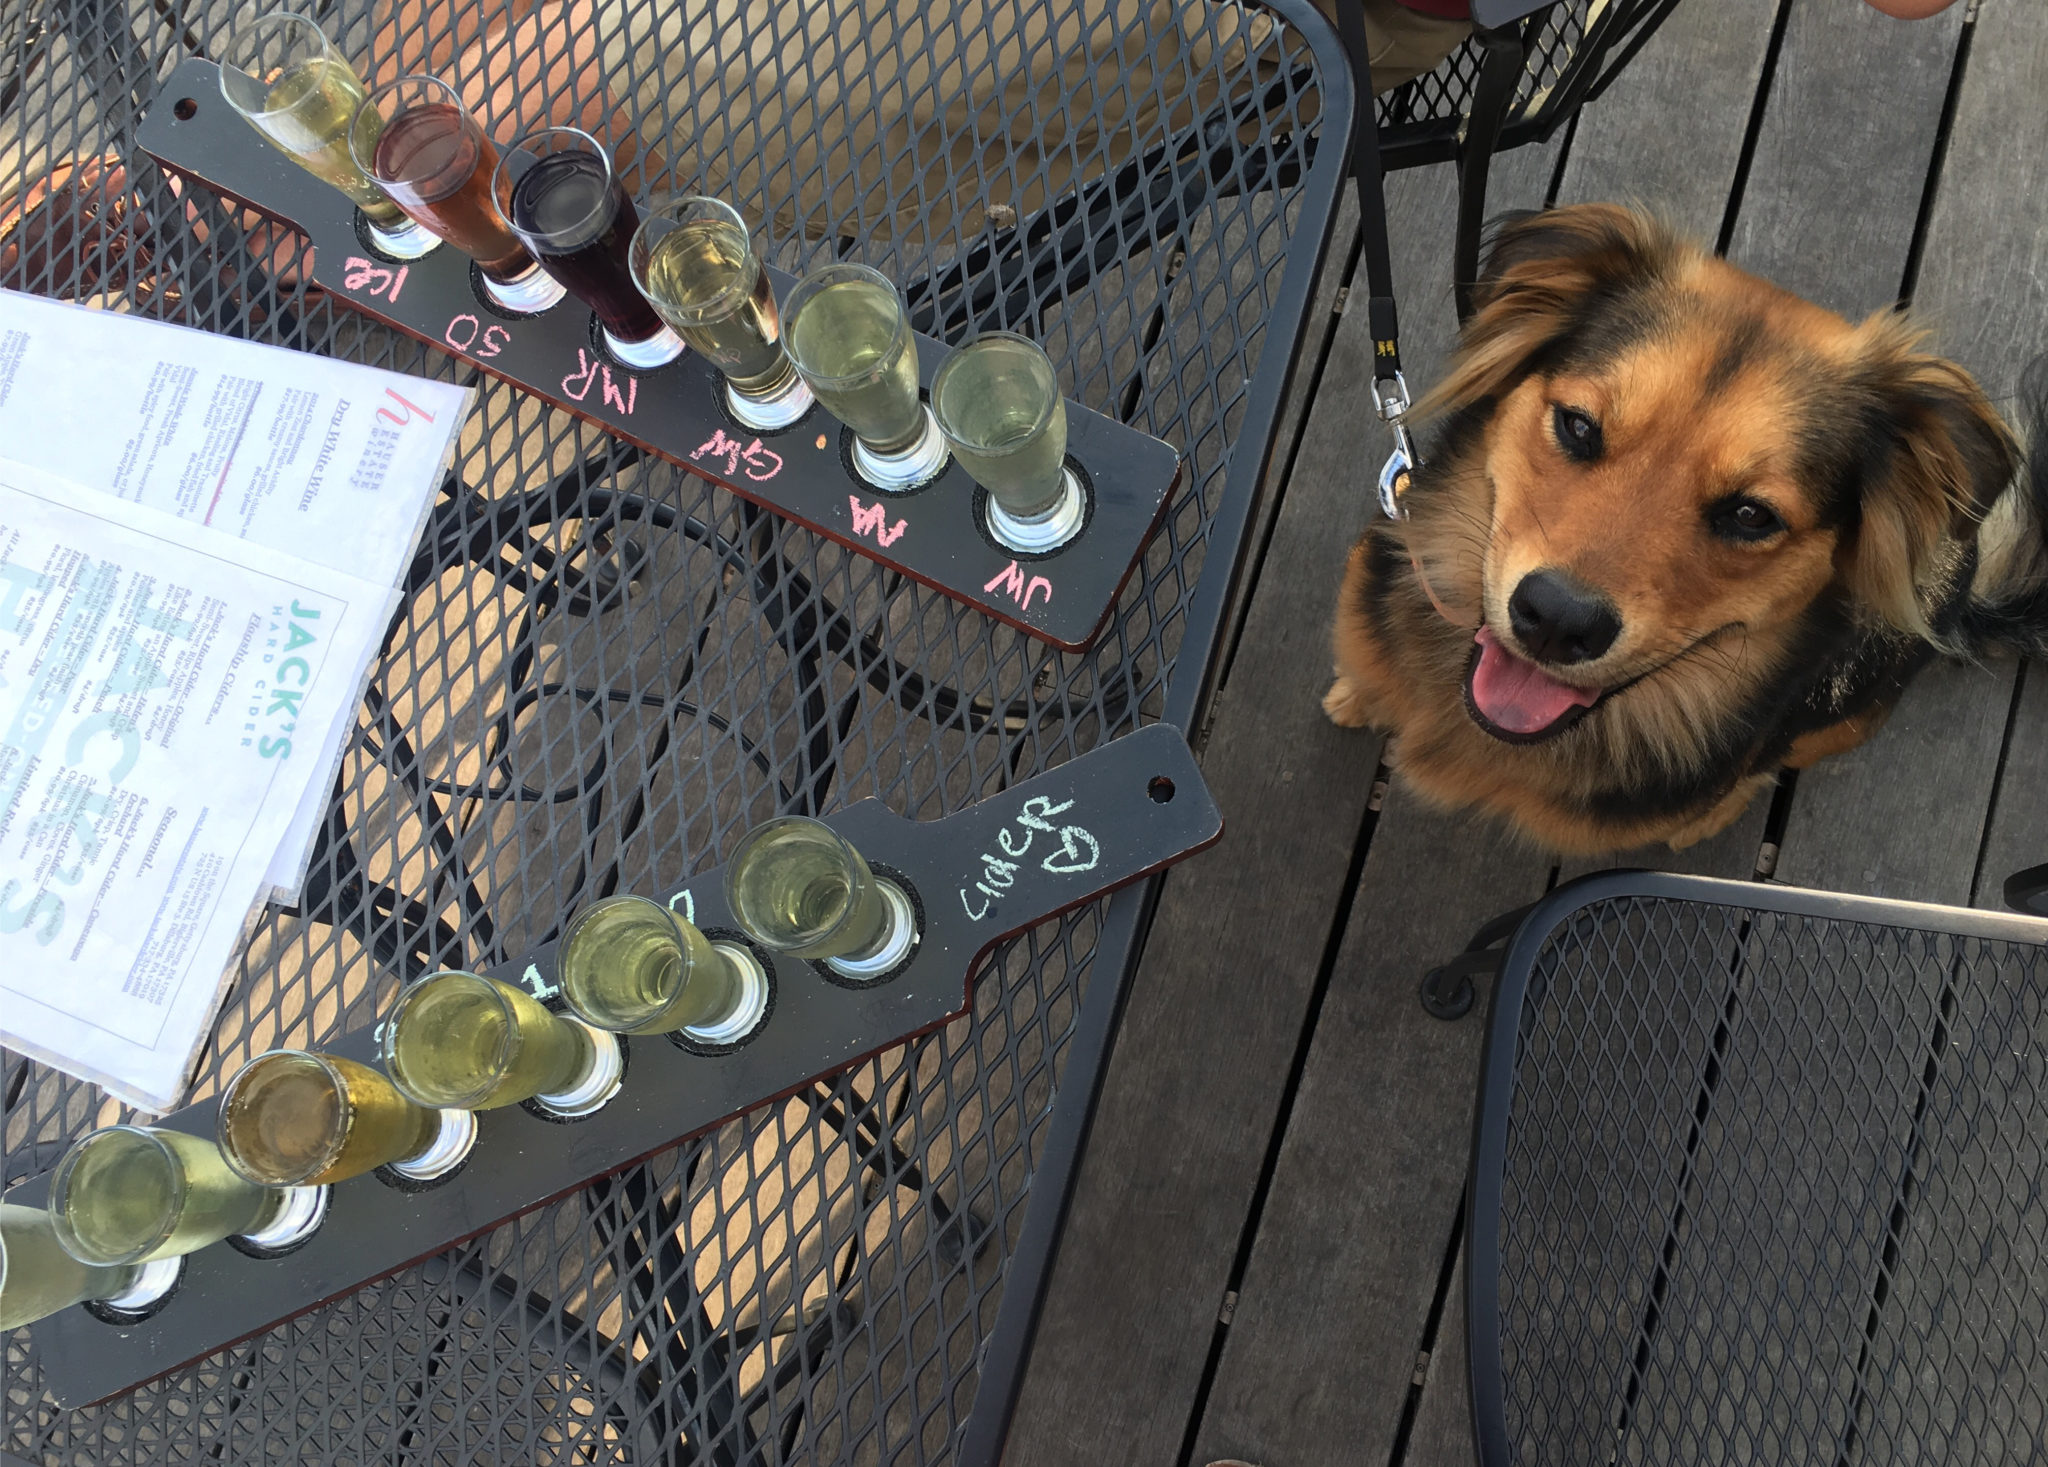 Dog enjoying cider flight at Jack's Hard Cider.